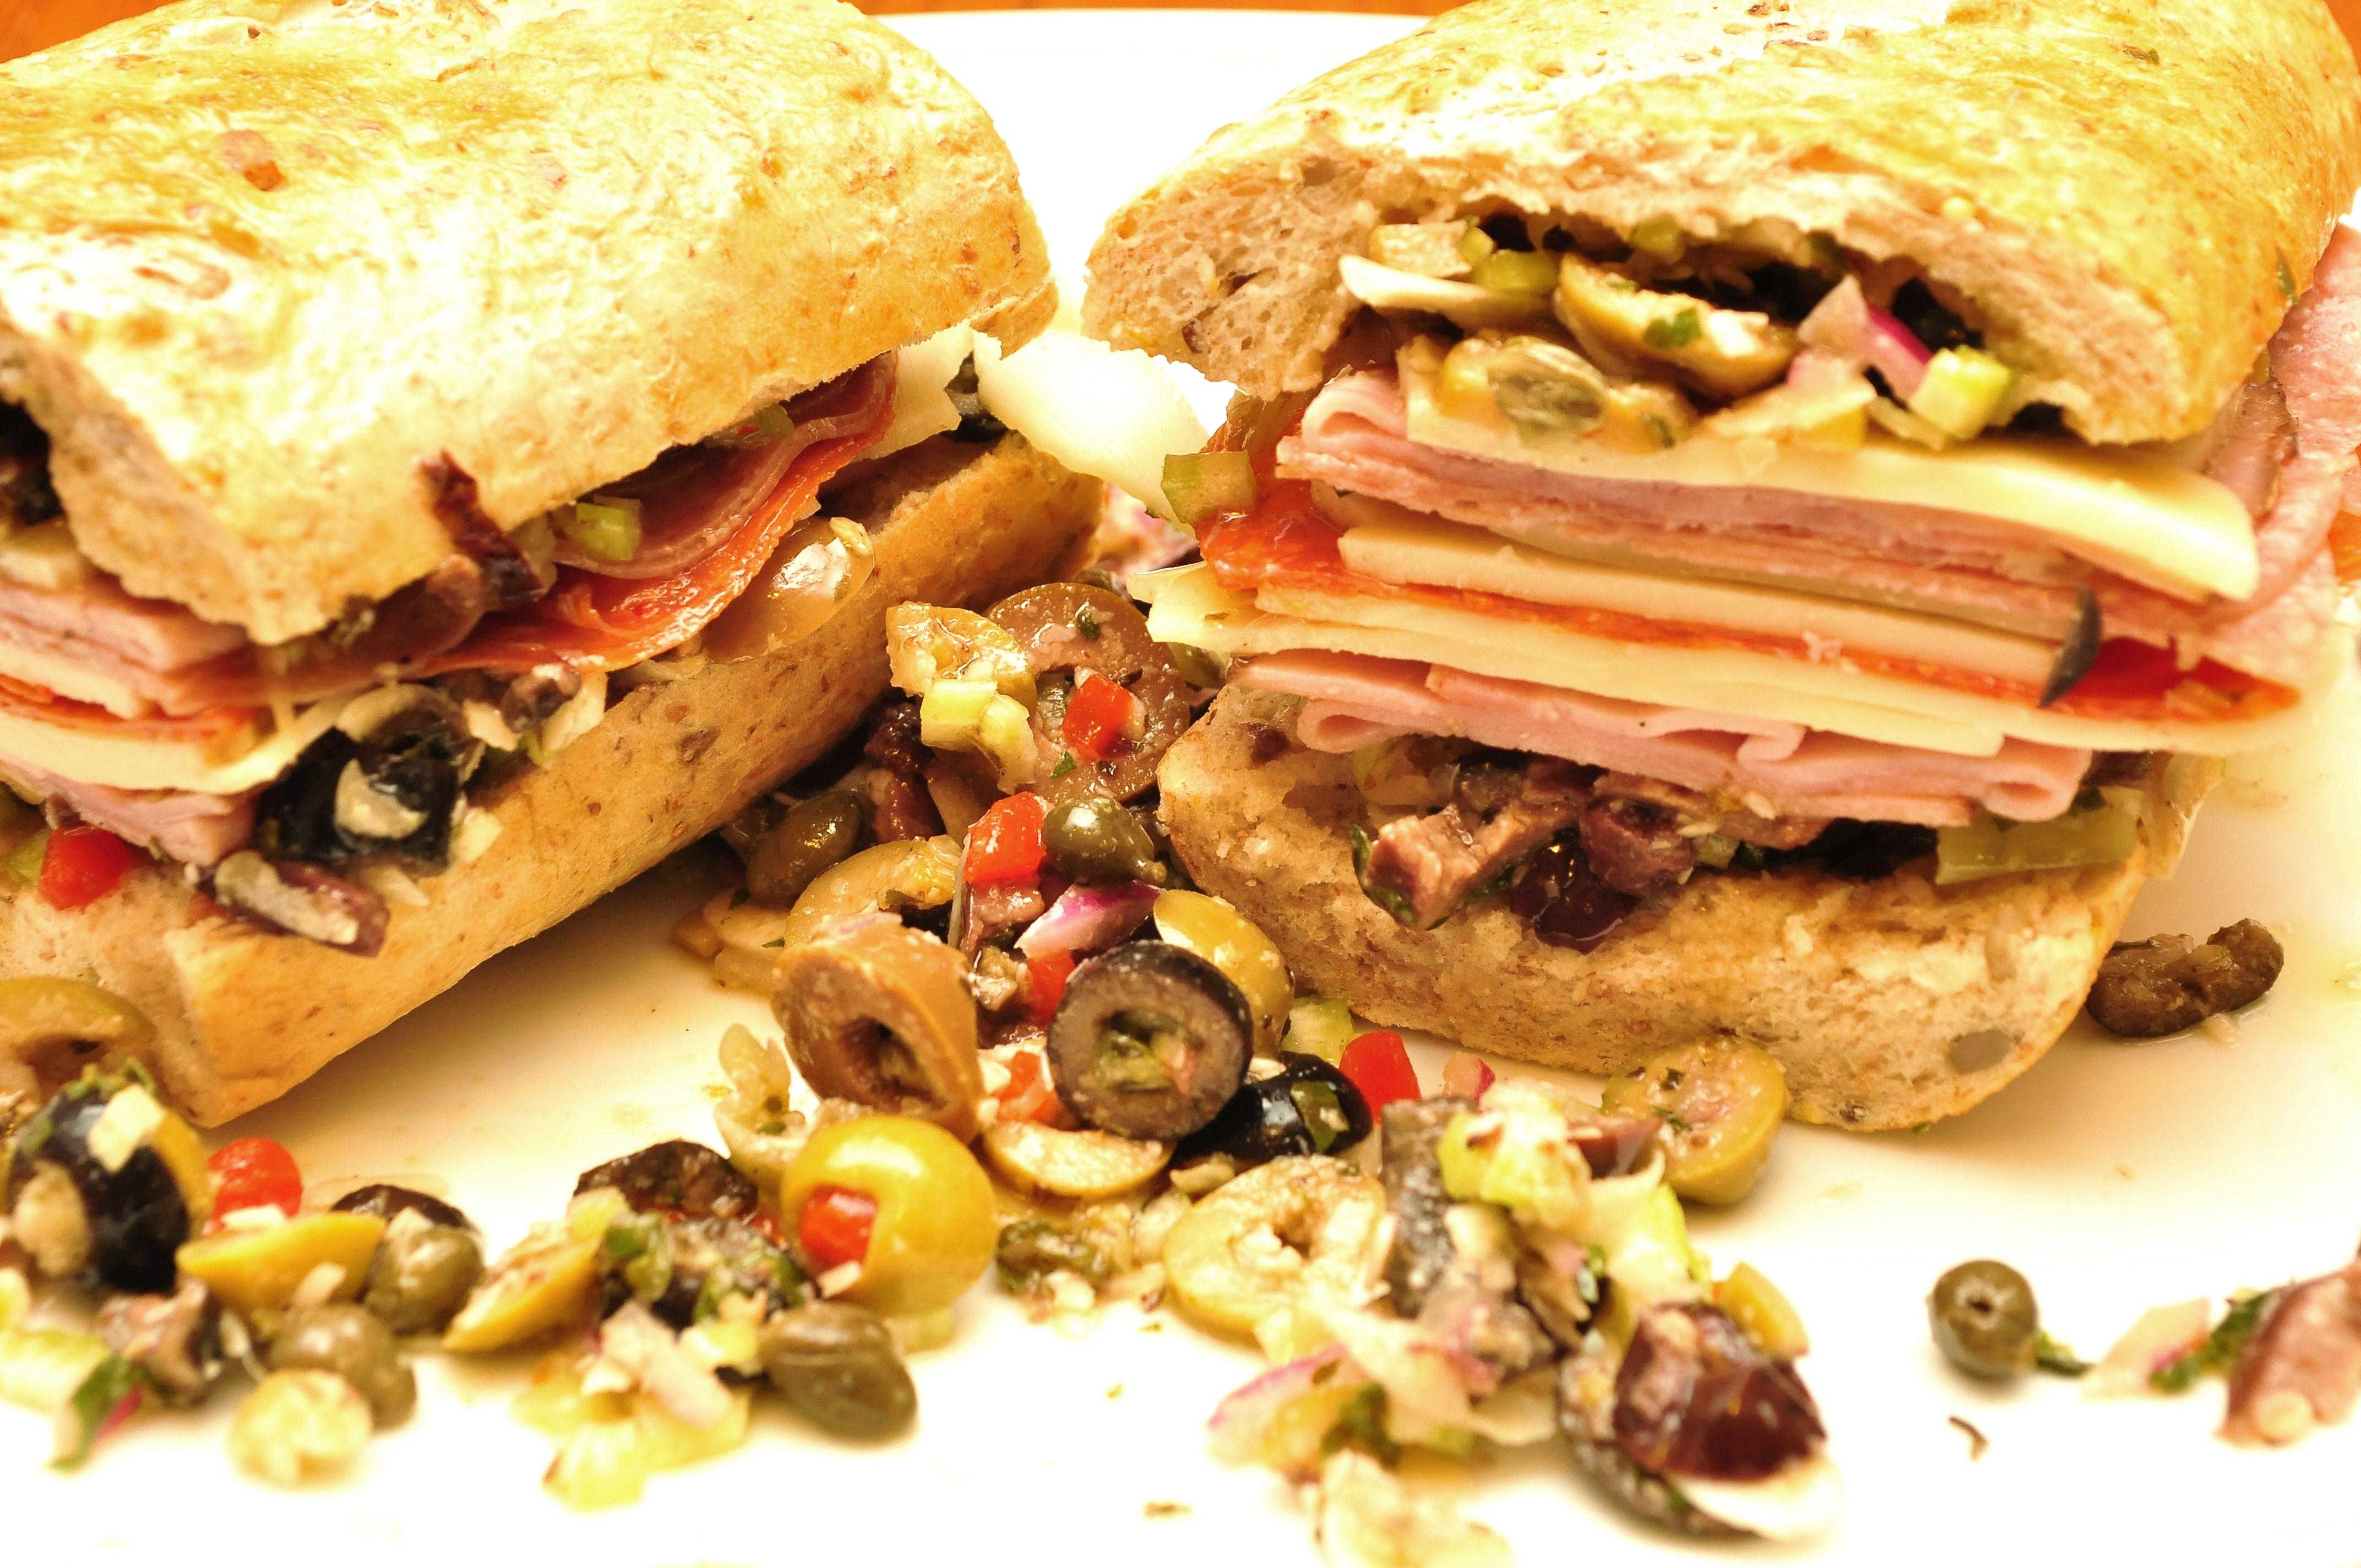 File:Sandwich similar to a muffuletta.jpg - Wikimedia Commons